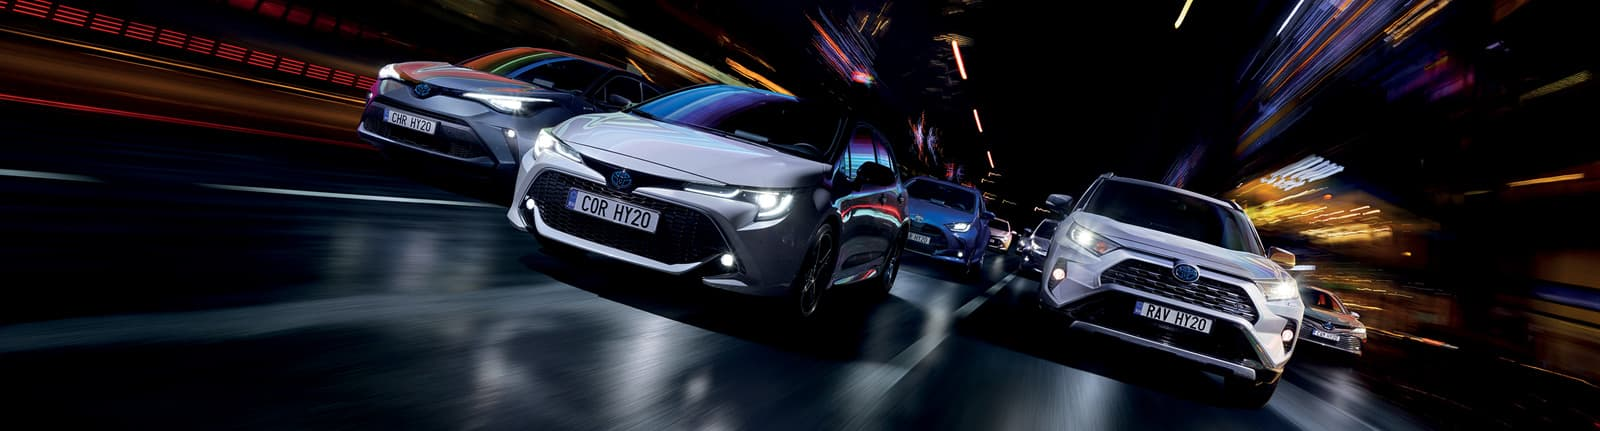 20 ans d'Hybride Toyota